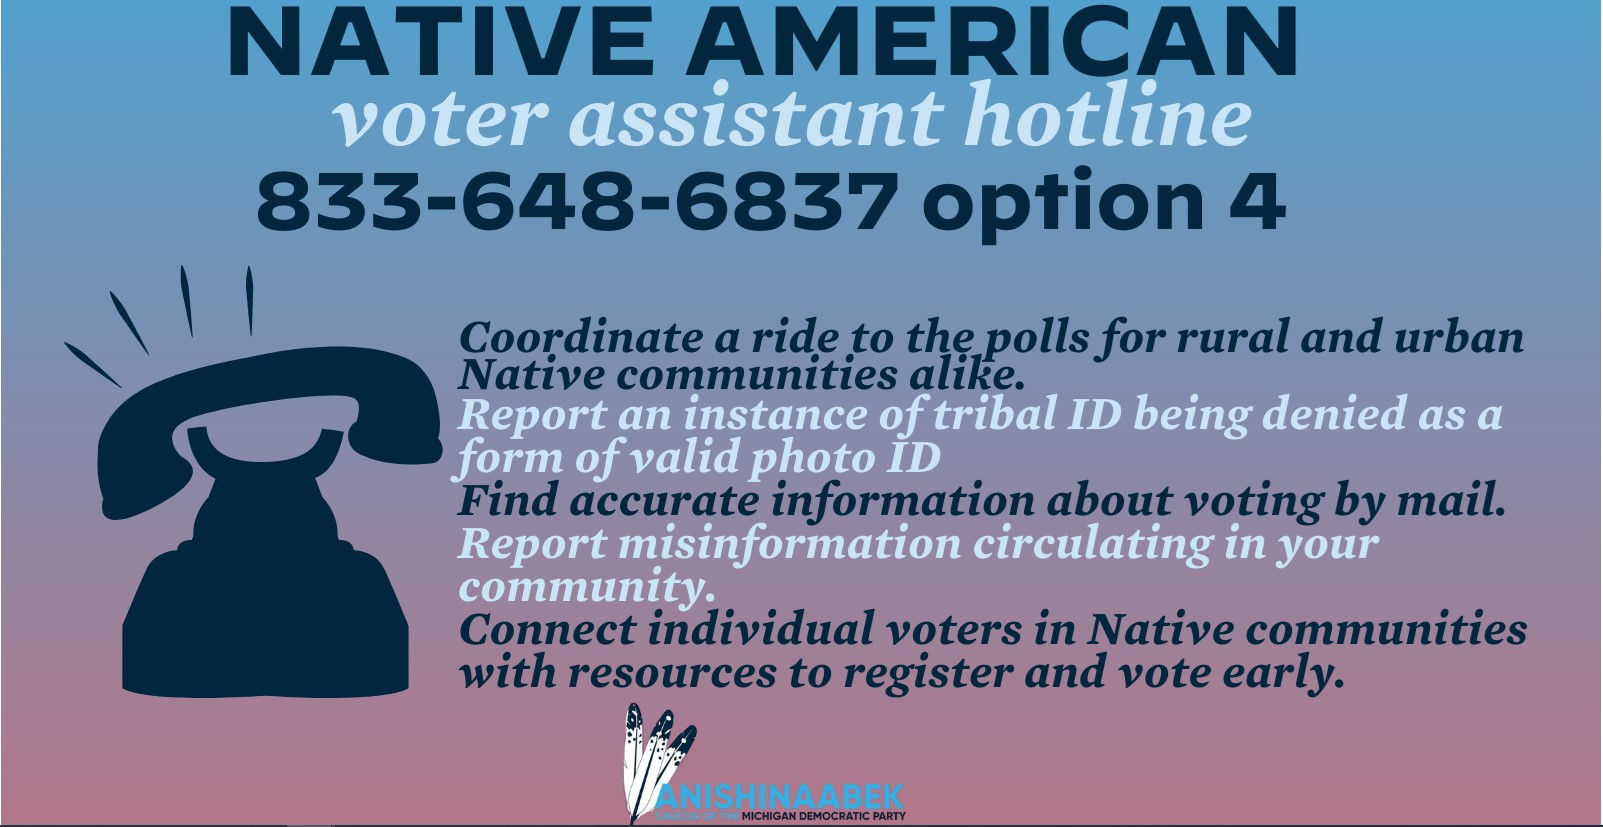 Voter Hotline